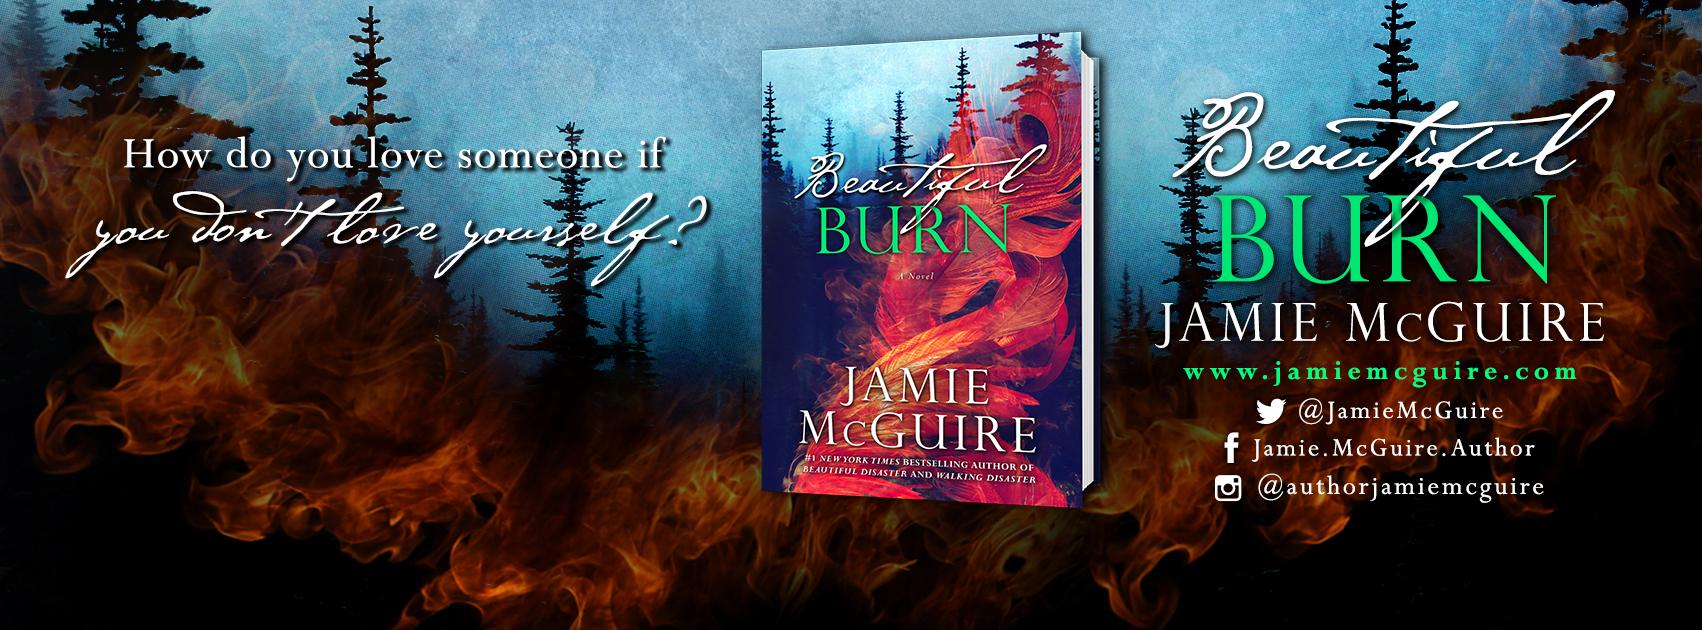 Beautiful-Burn-FB-banner.jpg